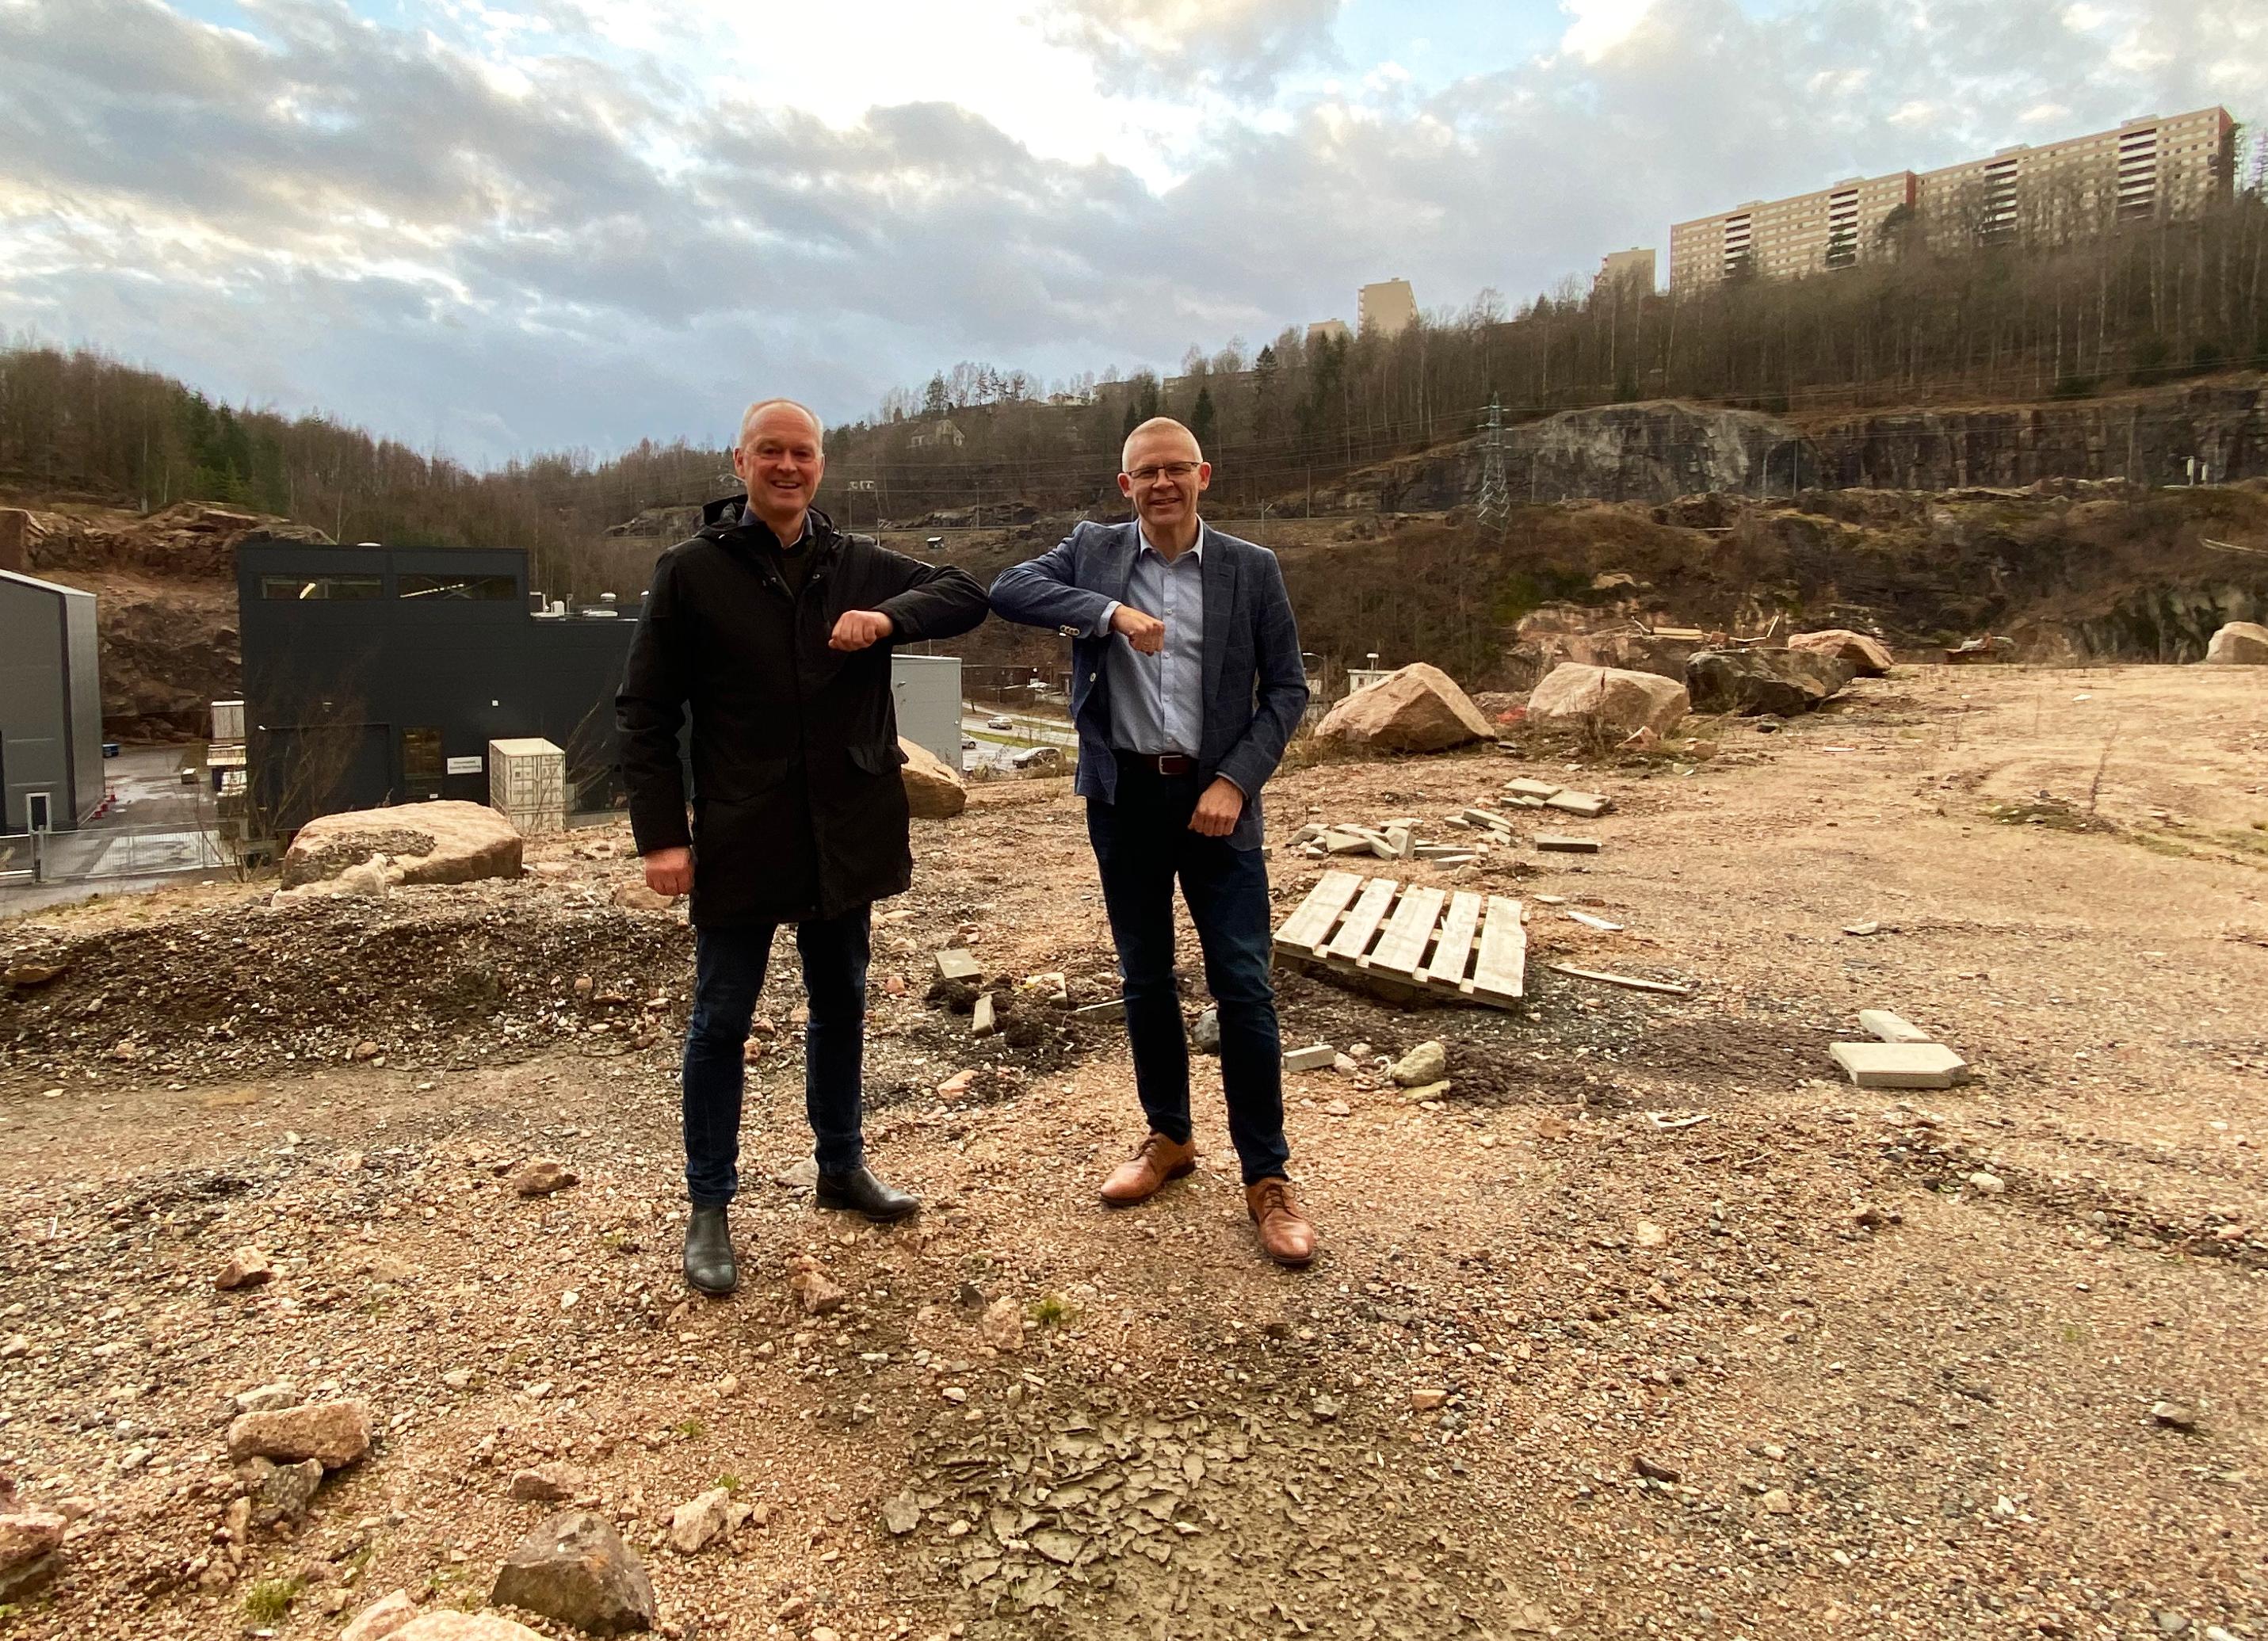 Morten Hotvedt og Bjørn Holm på Kobbervik Næringspark